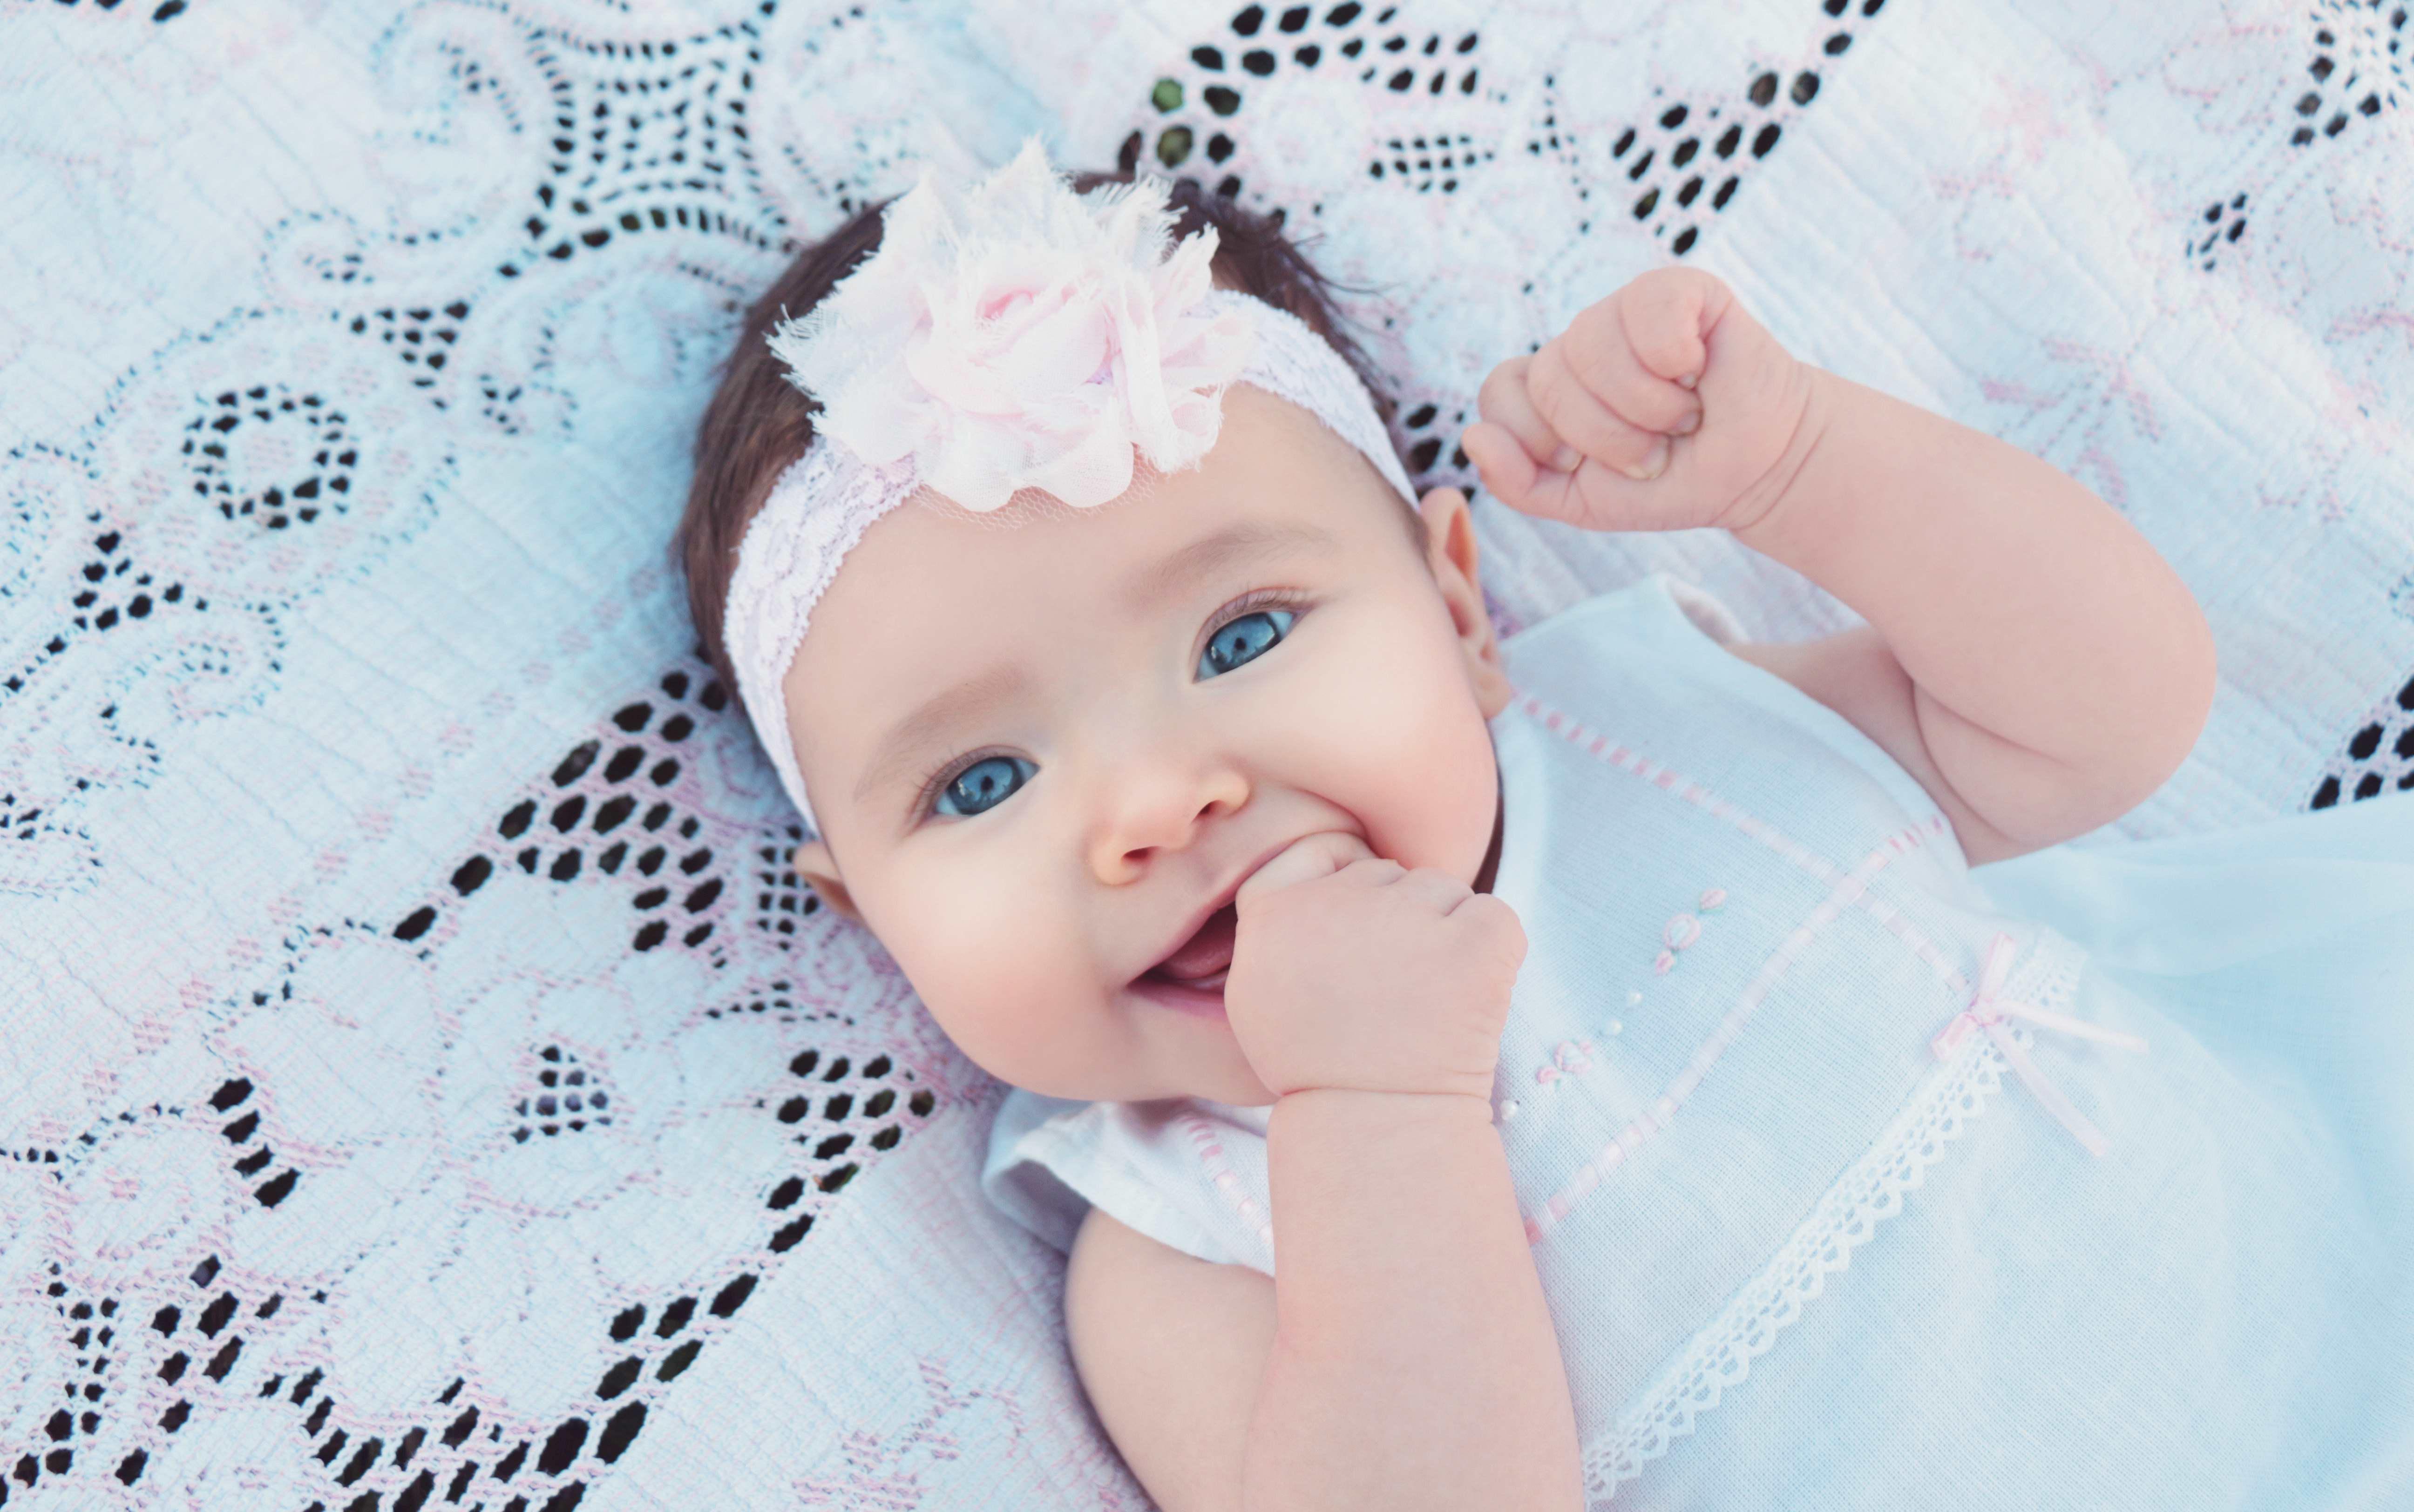 – 12 a Furlong family portrait photographer katherine eastman photography miami south florida birthday fairytale chagrin falls swing baby